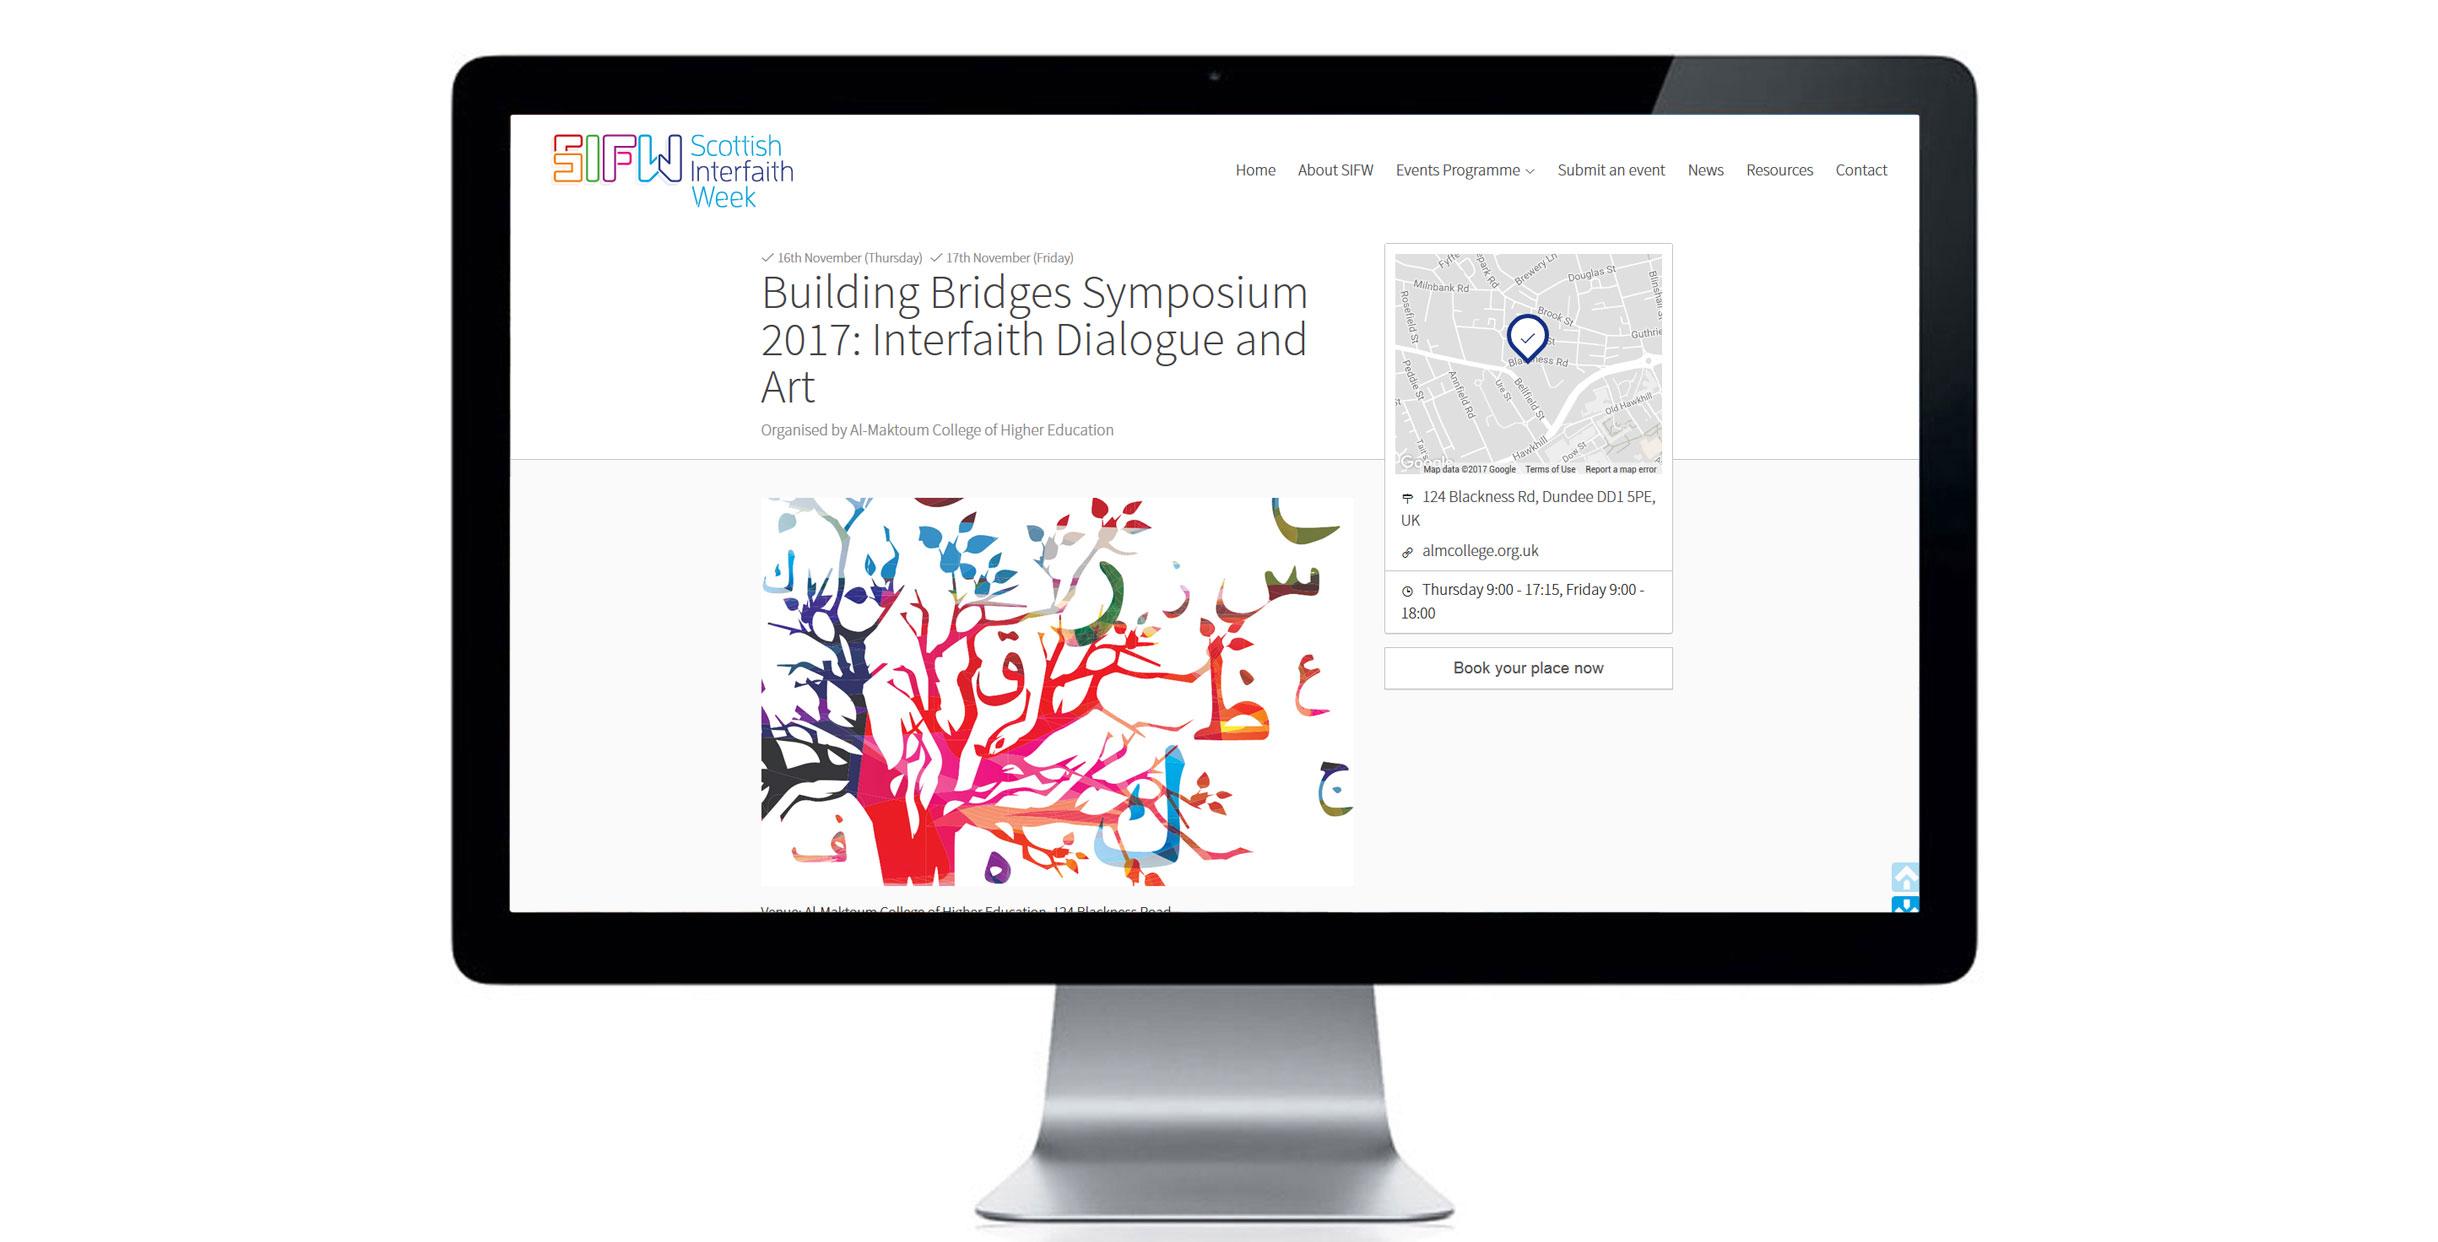 Website design for Scottish based charity event, Scottish Interfaith Week.